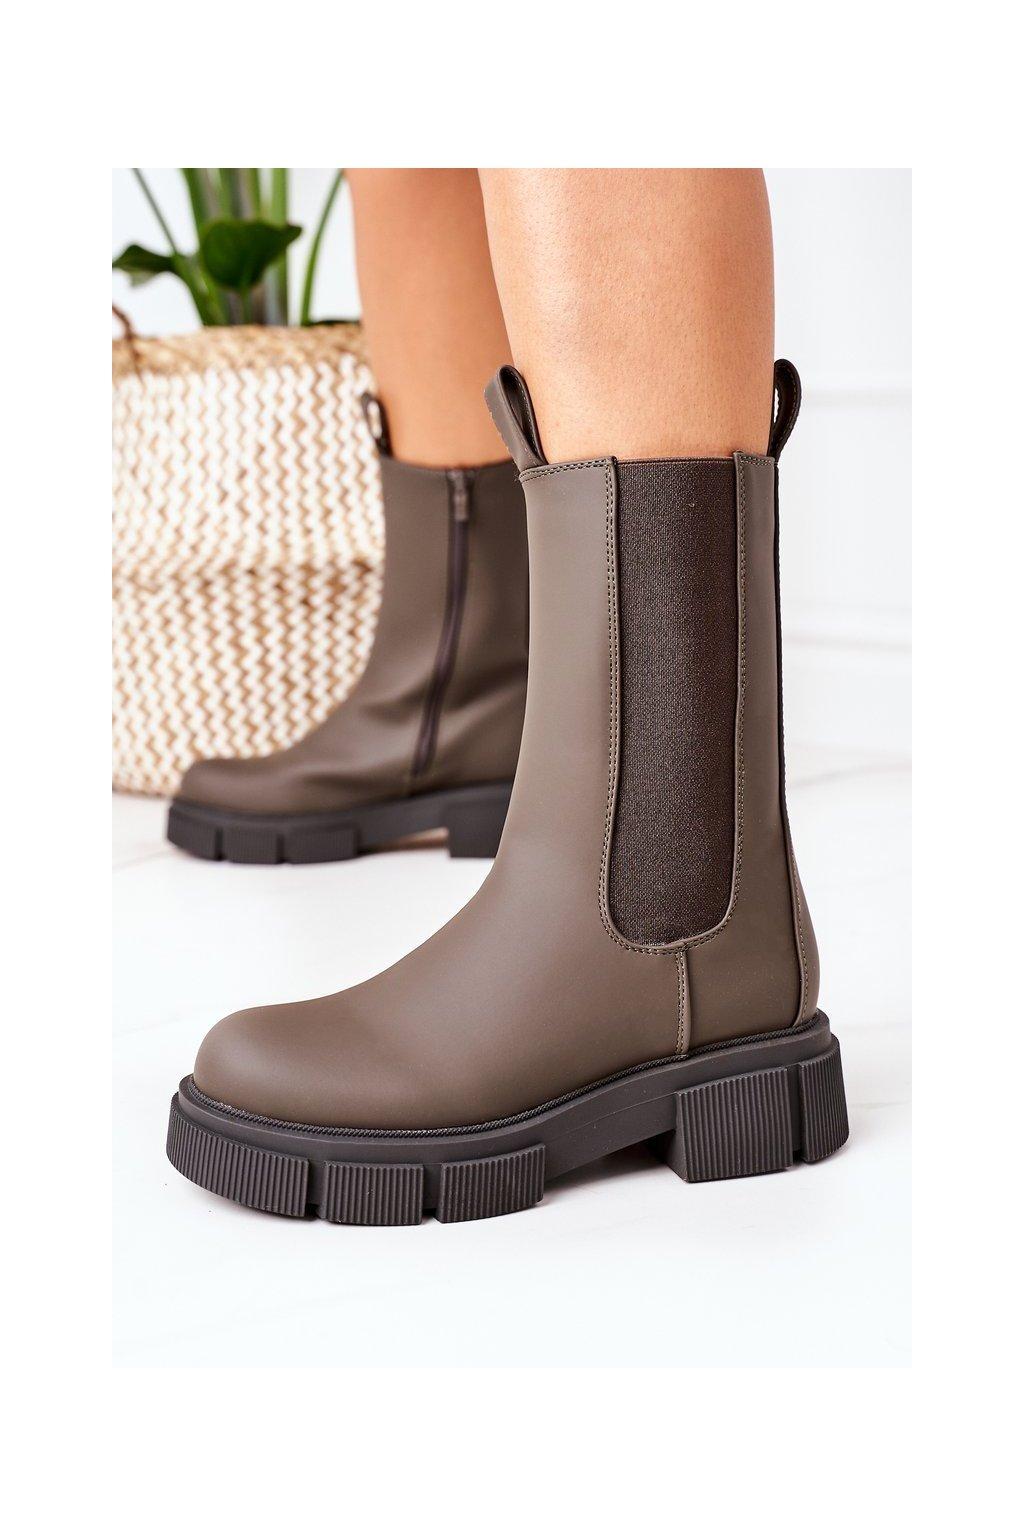 Členkové topánky na podpätku farba zelená kód obuvi QT16 ARMY GREEN